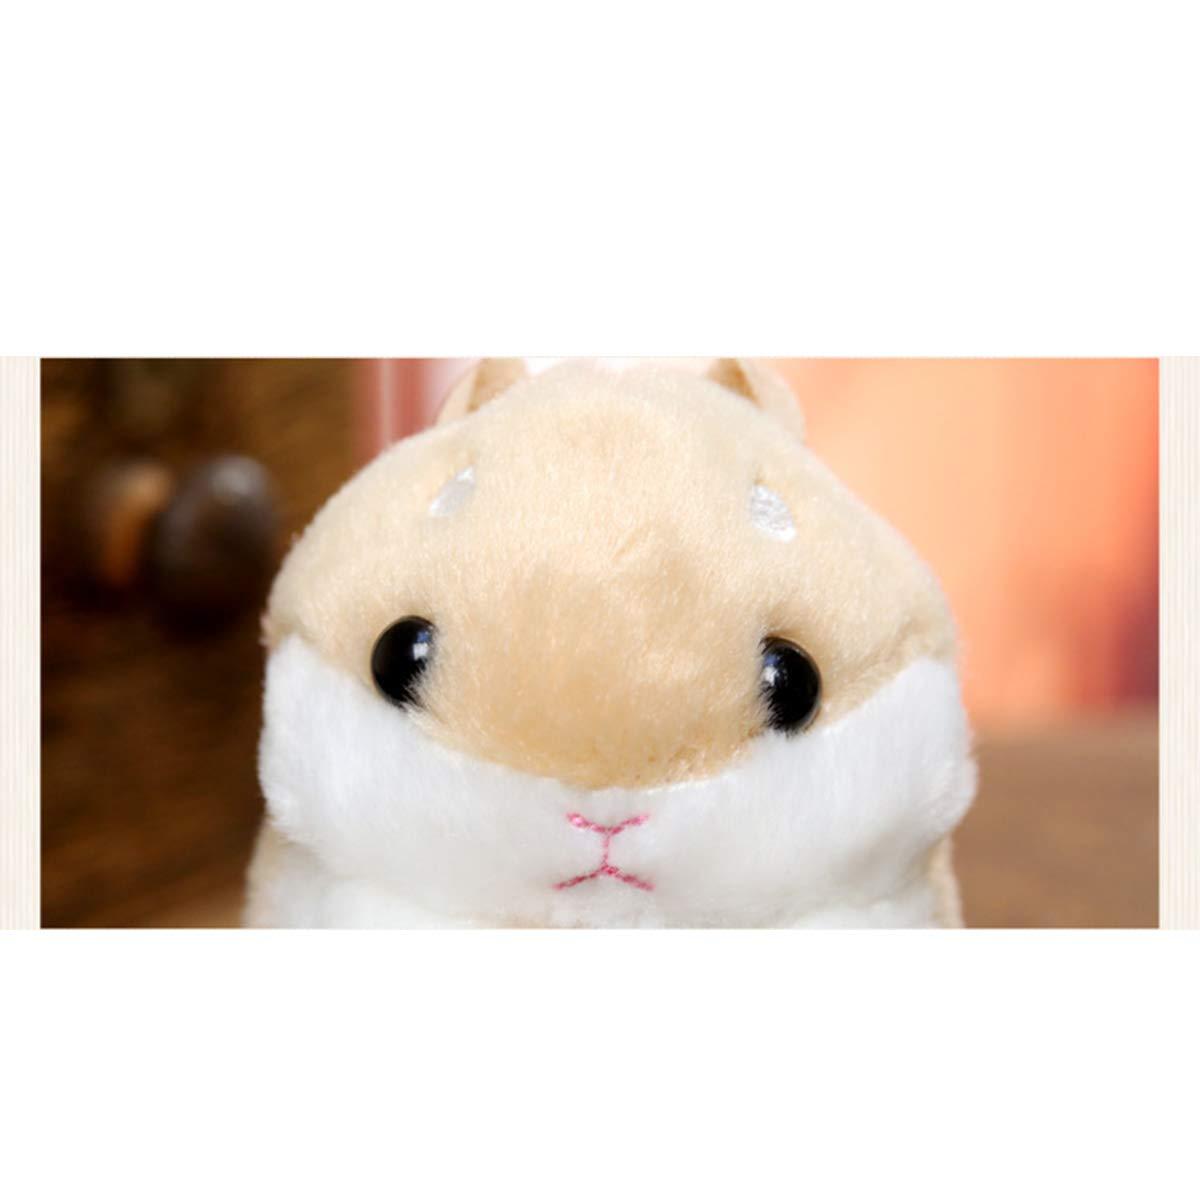 Mini 10cm Petit Jouet Peluche Sœur Peluches Hamster Douce uclJK51TF3